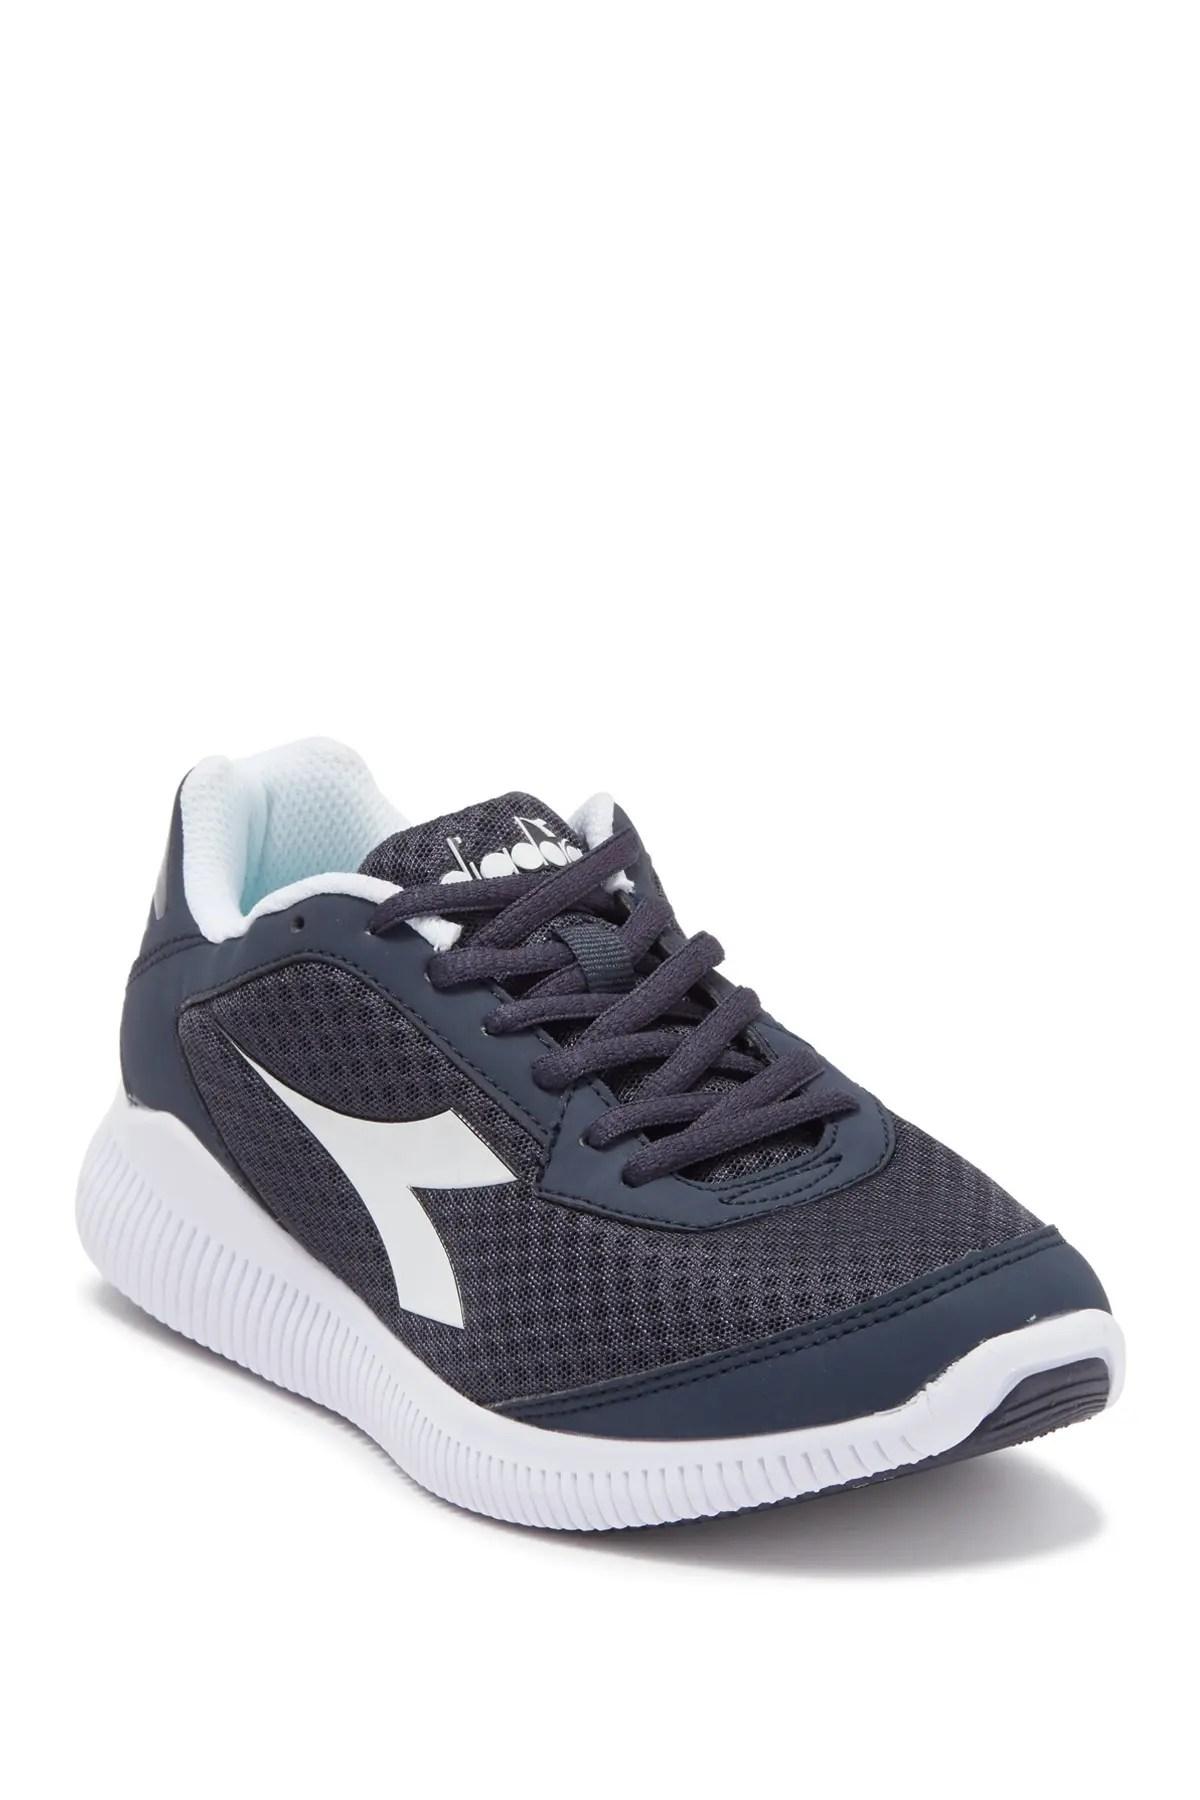 sneakers tennis shoes for women nordstrom rack